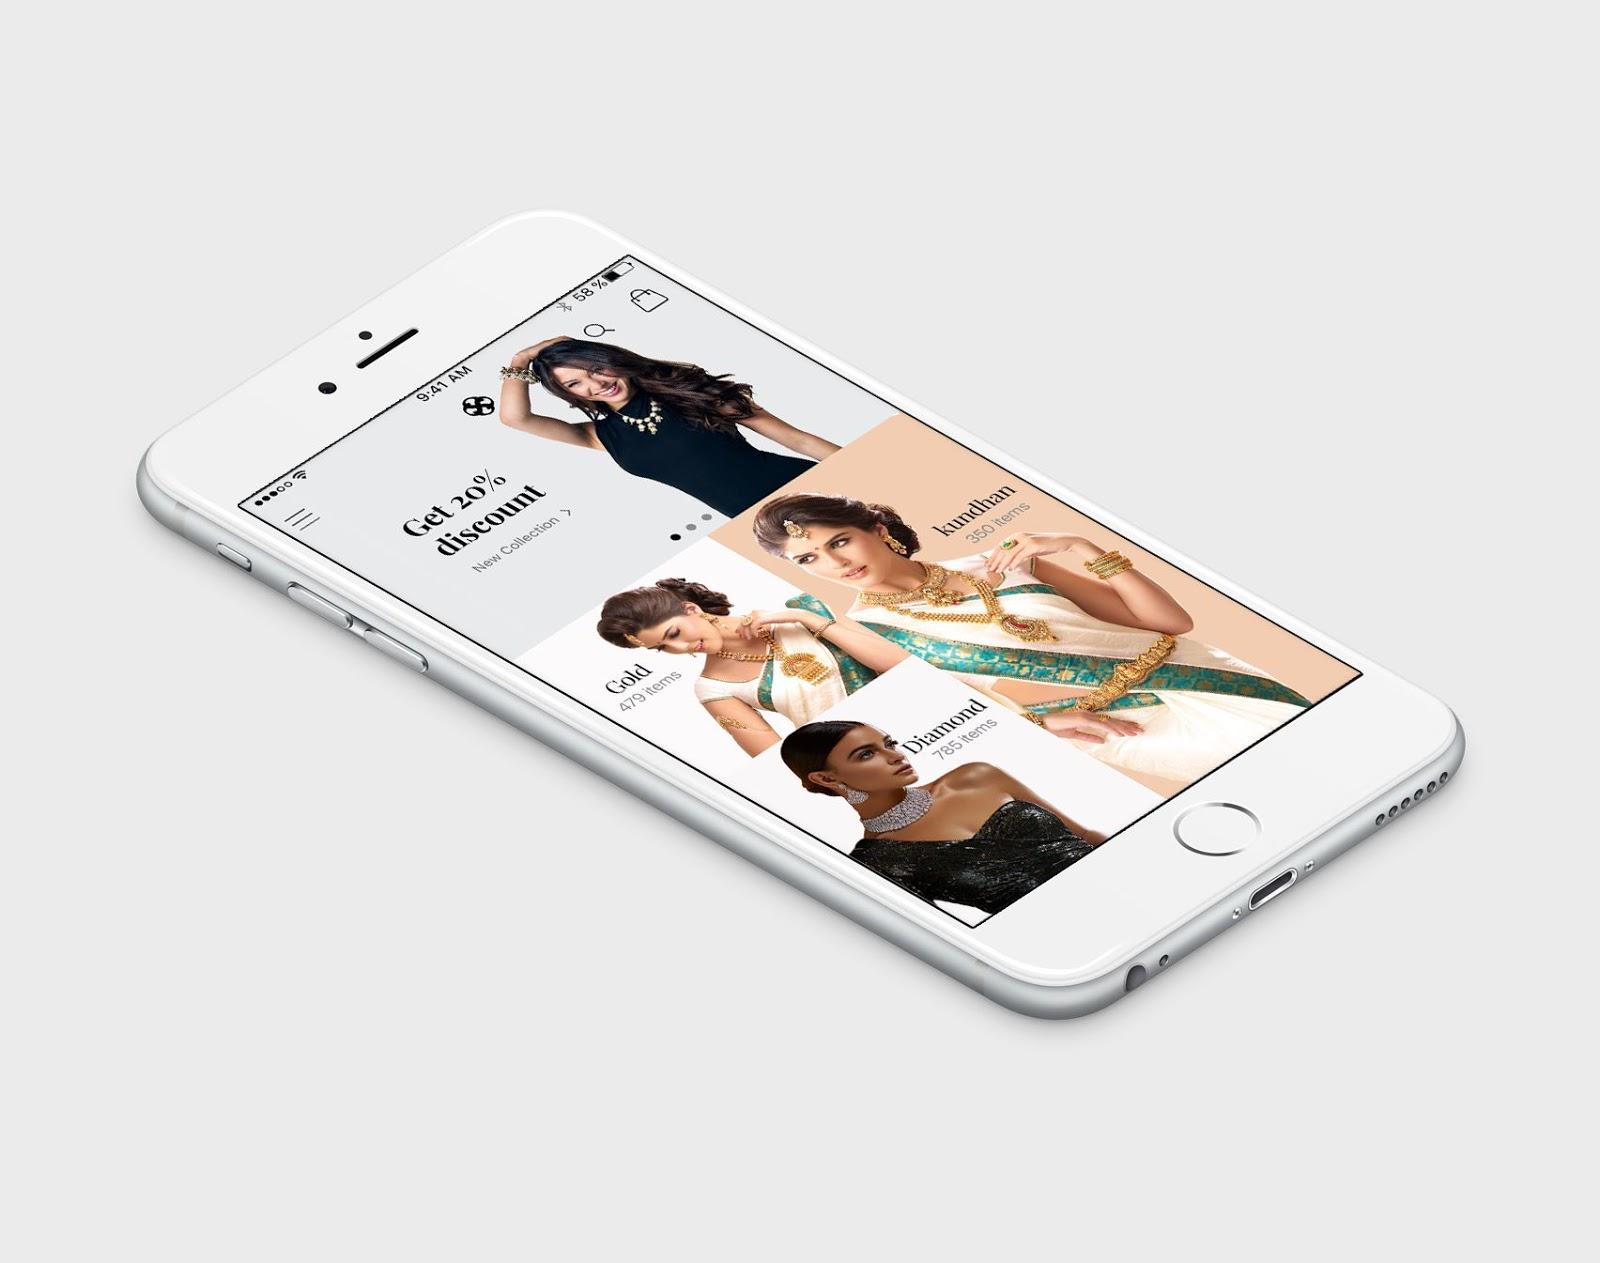 Jewellery%2BApp%2BUI%2BDesigns Jewellery App UI Designs download